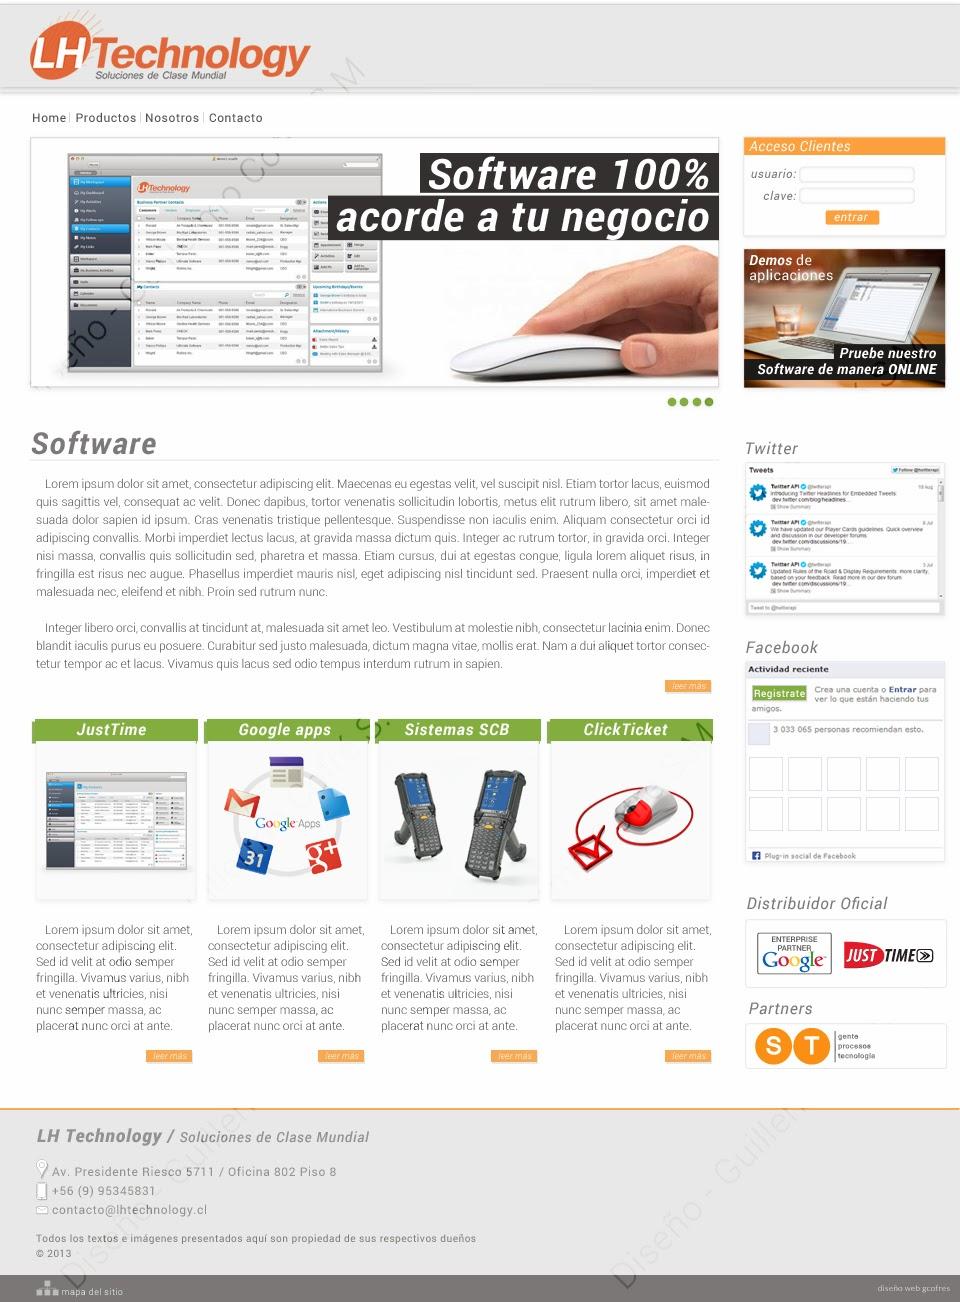 Propuesta de sitio web para LH Technology